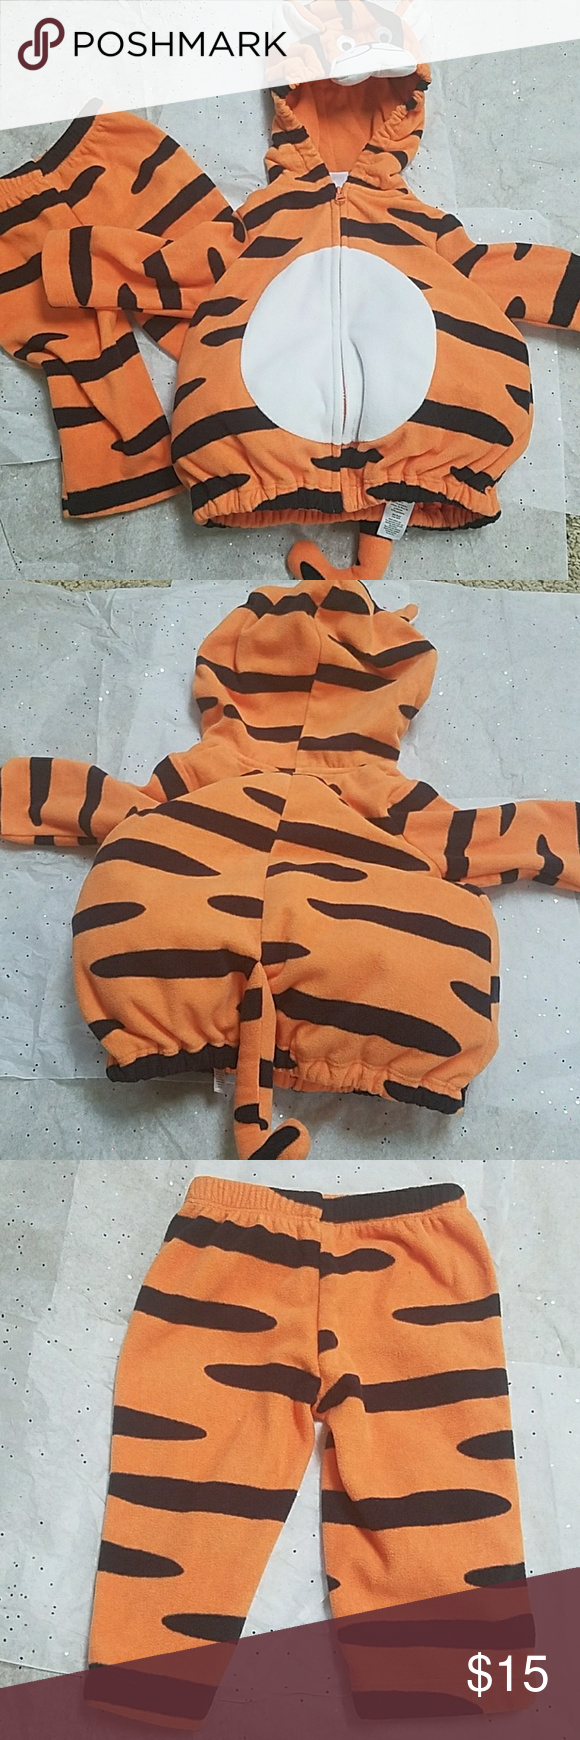 301df5e2d Tiger baby costume Super adorable fleece baby tiger 2-pc costume. polyfil  around waist area. EUC Carter's Costumes